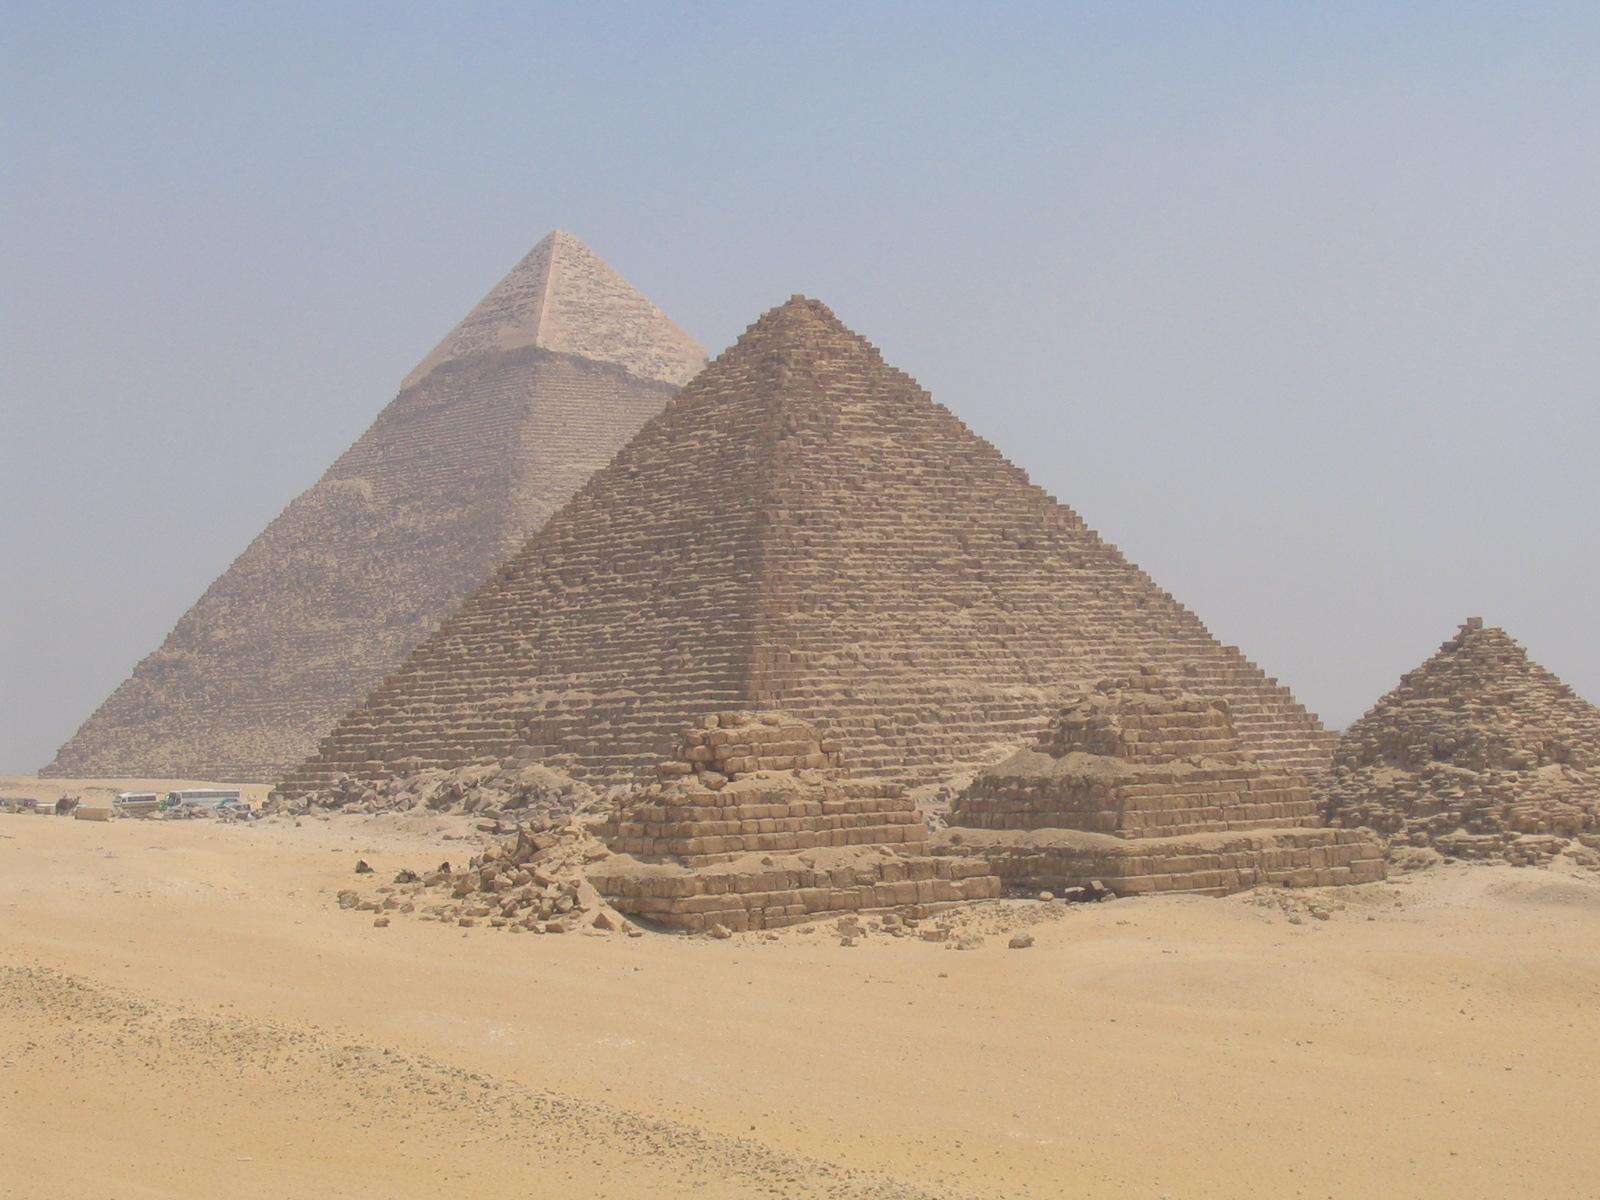 The Pyramids, I believe